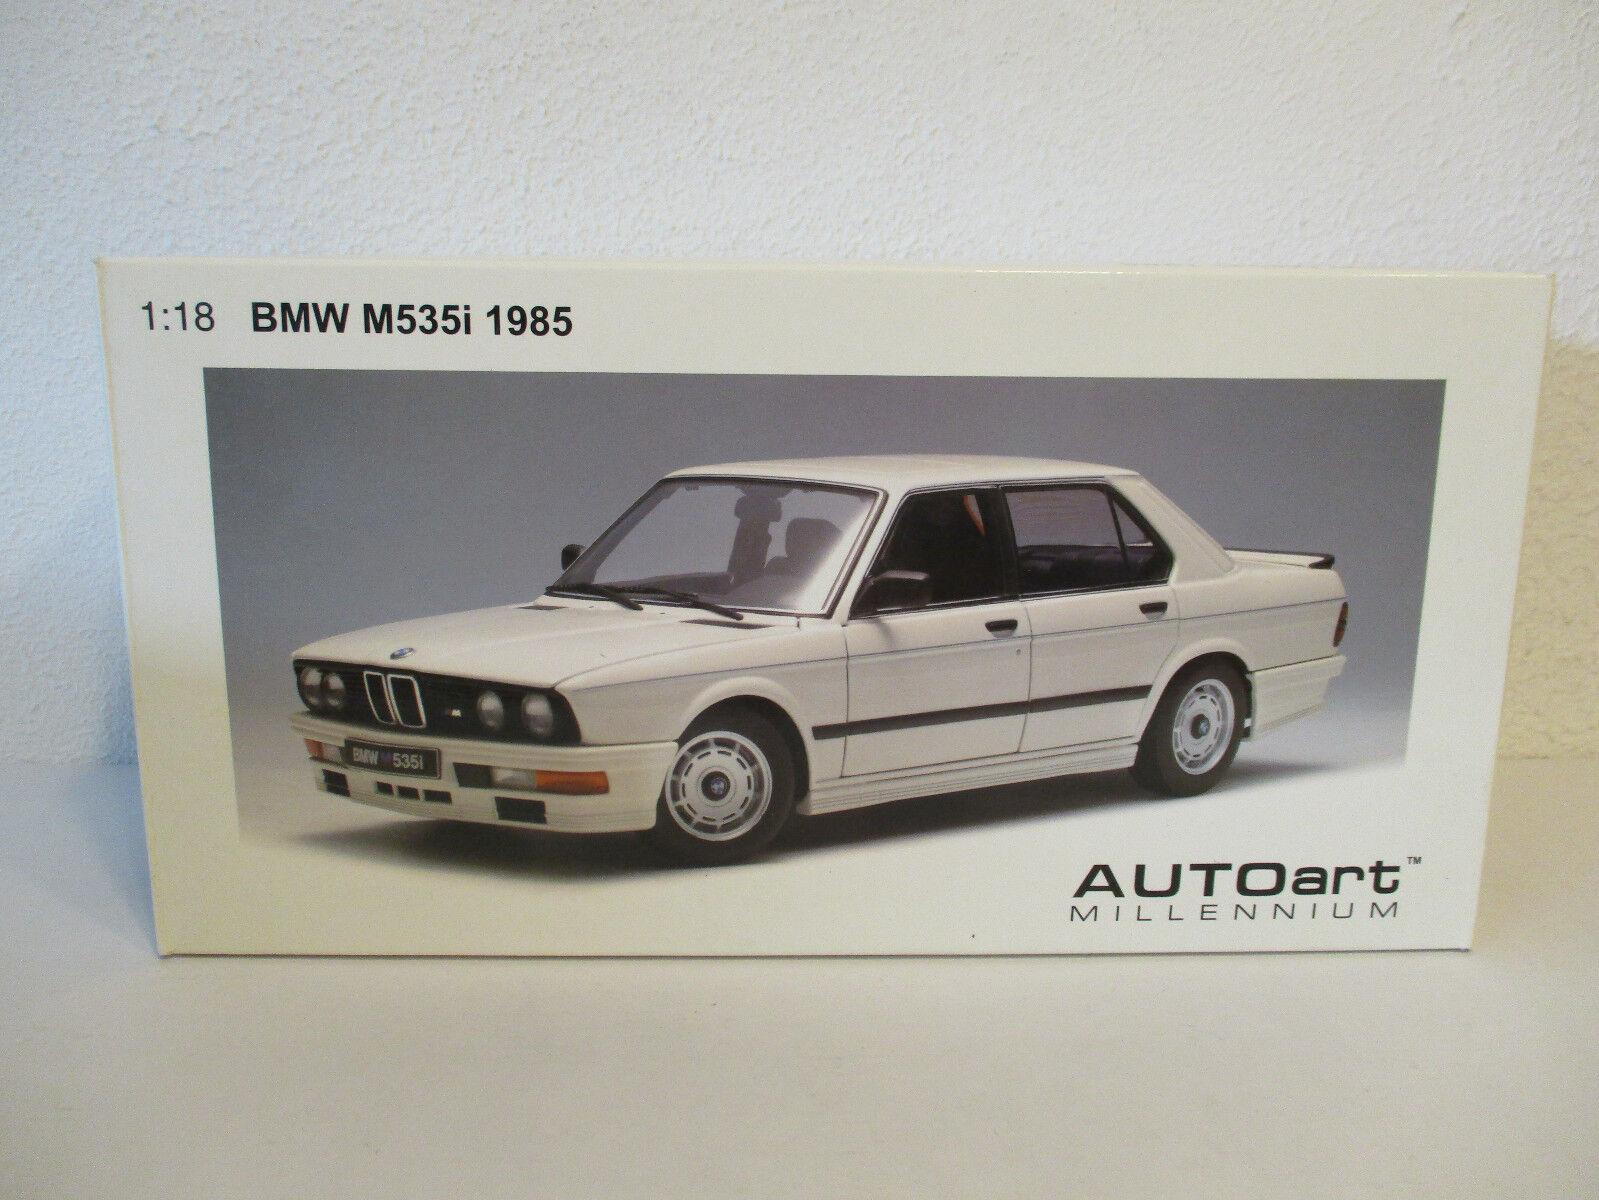 (Gol) 1 18 Autoart BMW M 535i 1985 Conversion NOUVEAU neuf dans sa boîte